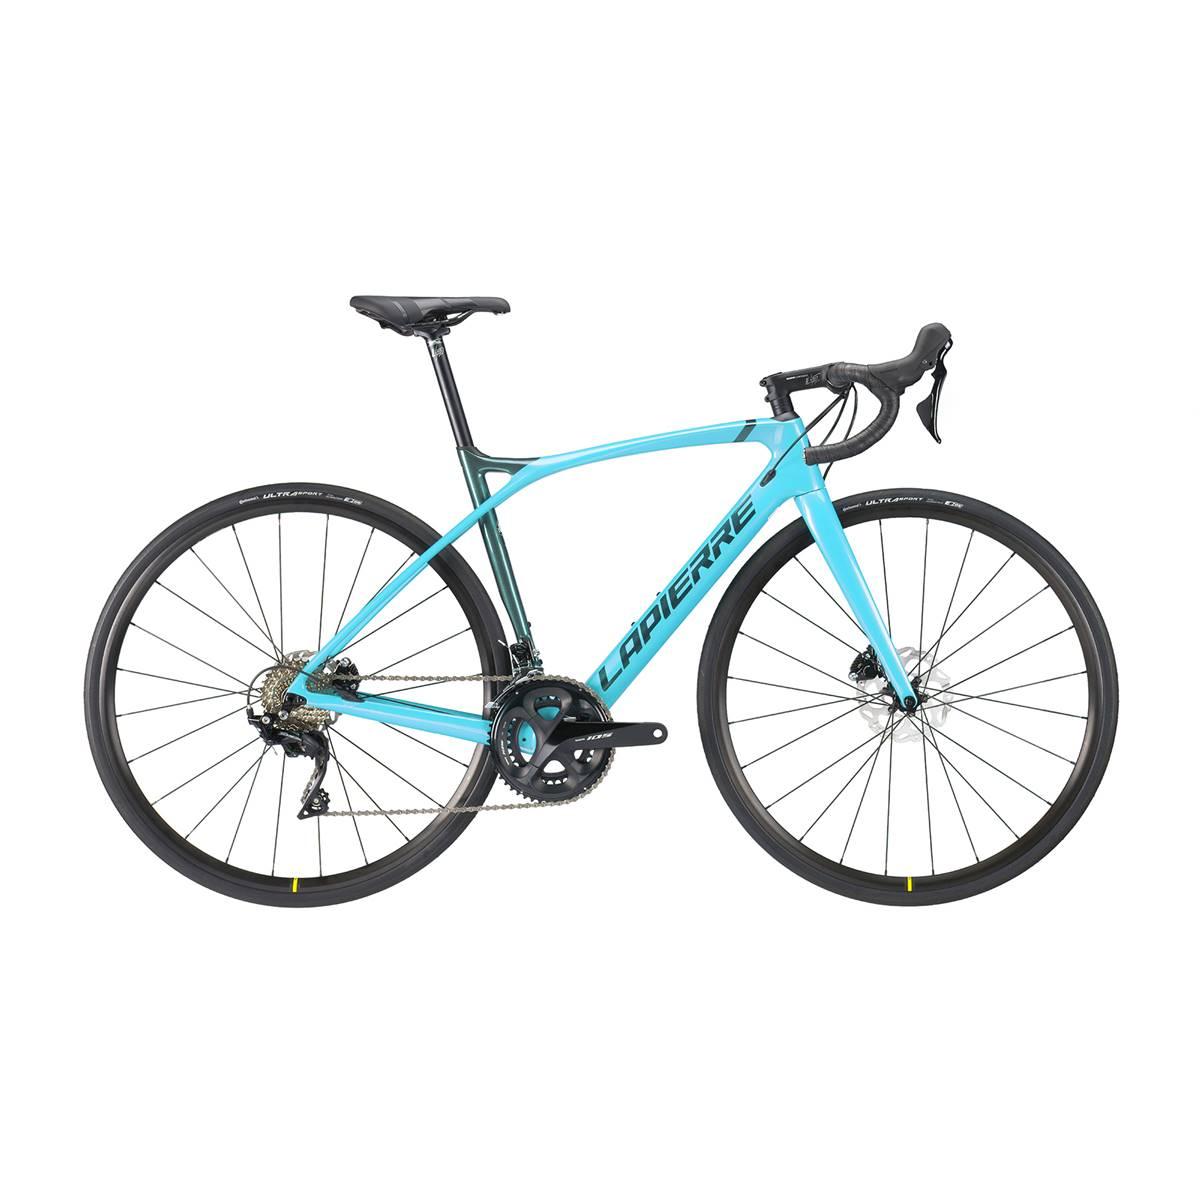 velo route - cyclisme - prix - promo